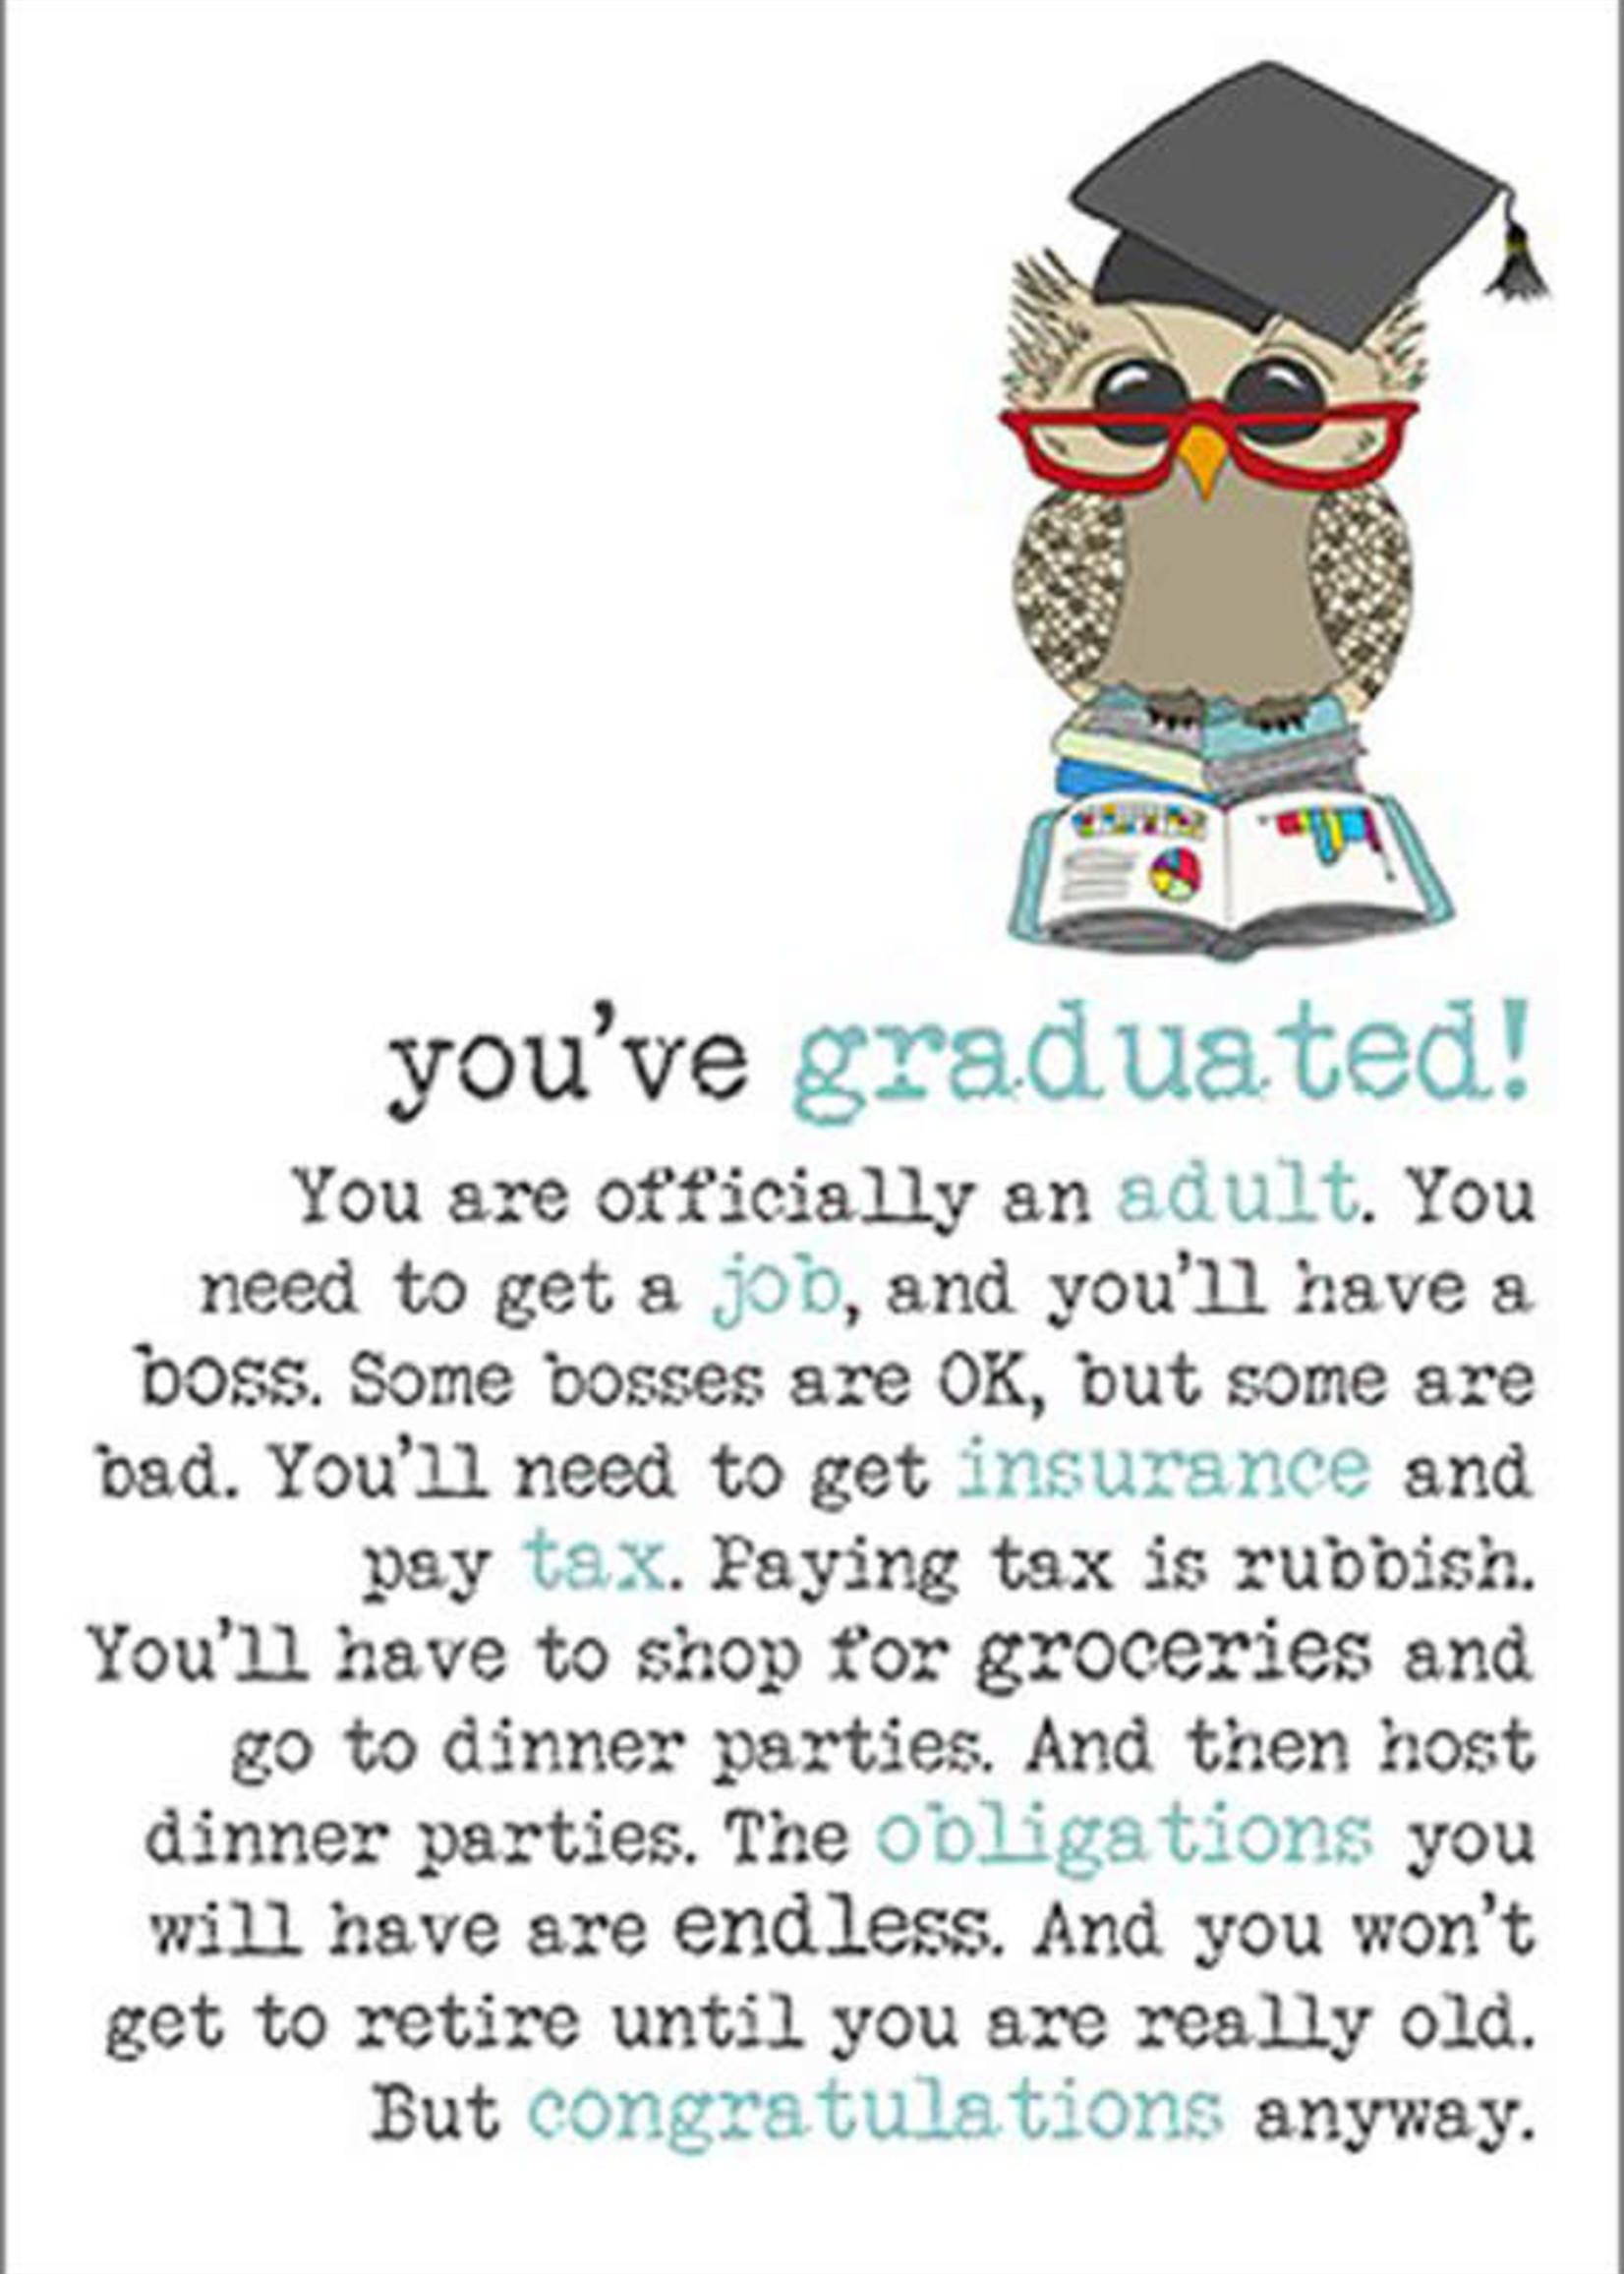 Card GRAD Owl You've Graduated!